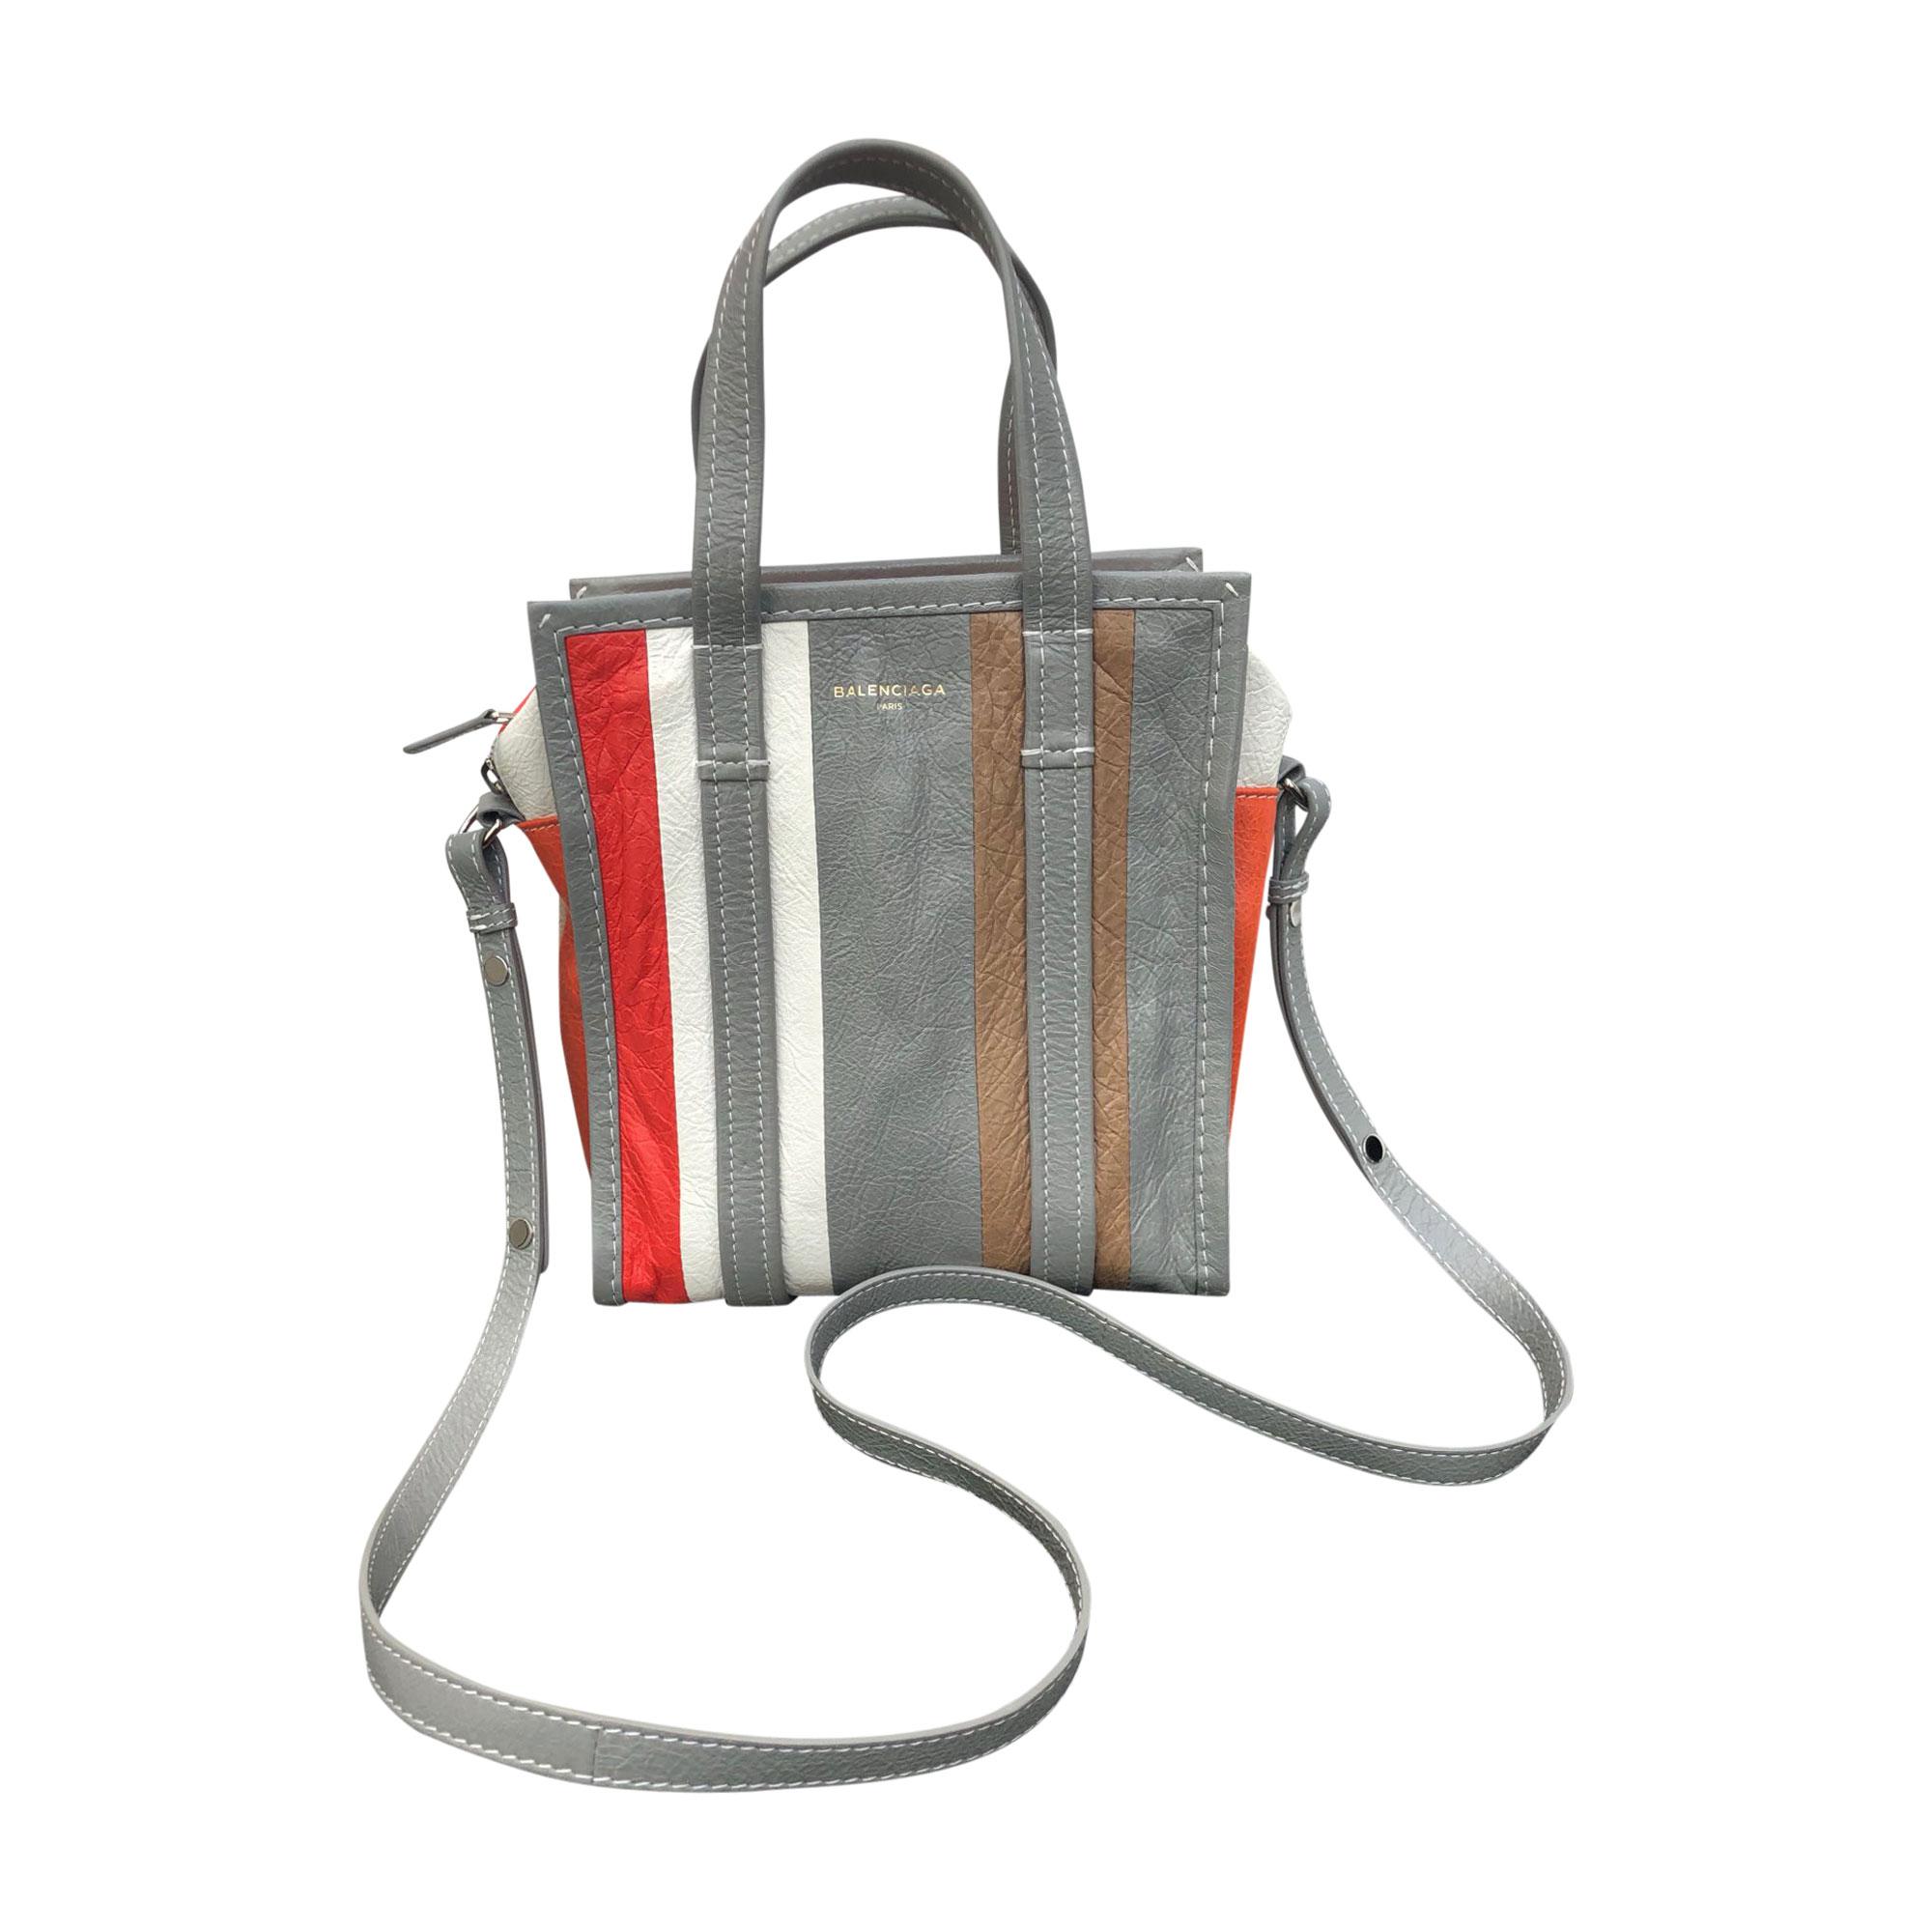 Leather Shoulder Bag BALENCIAGA Gray, charcoal